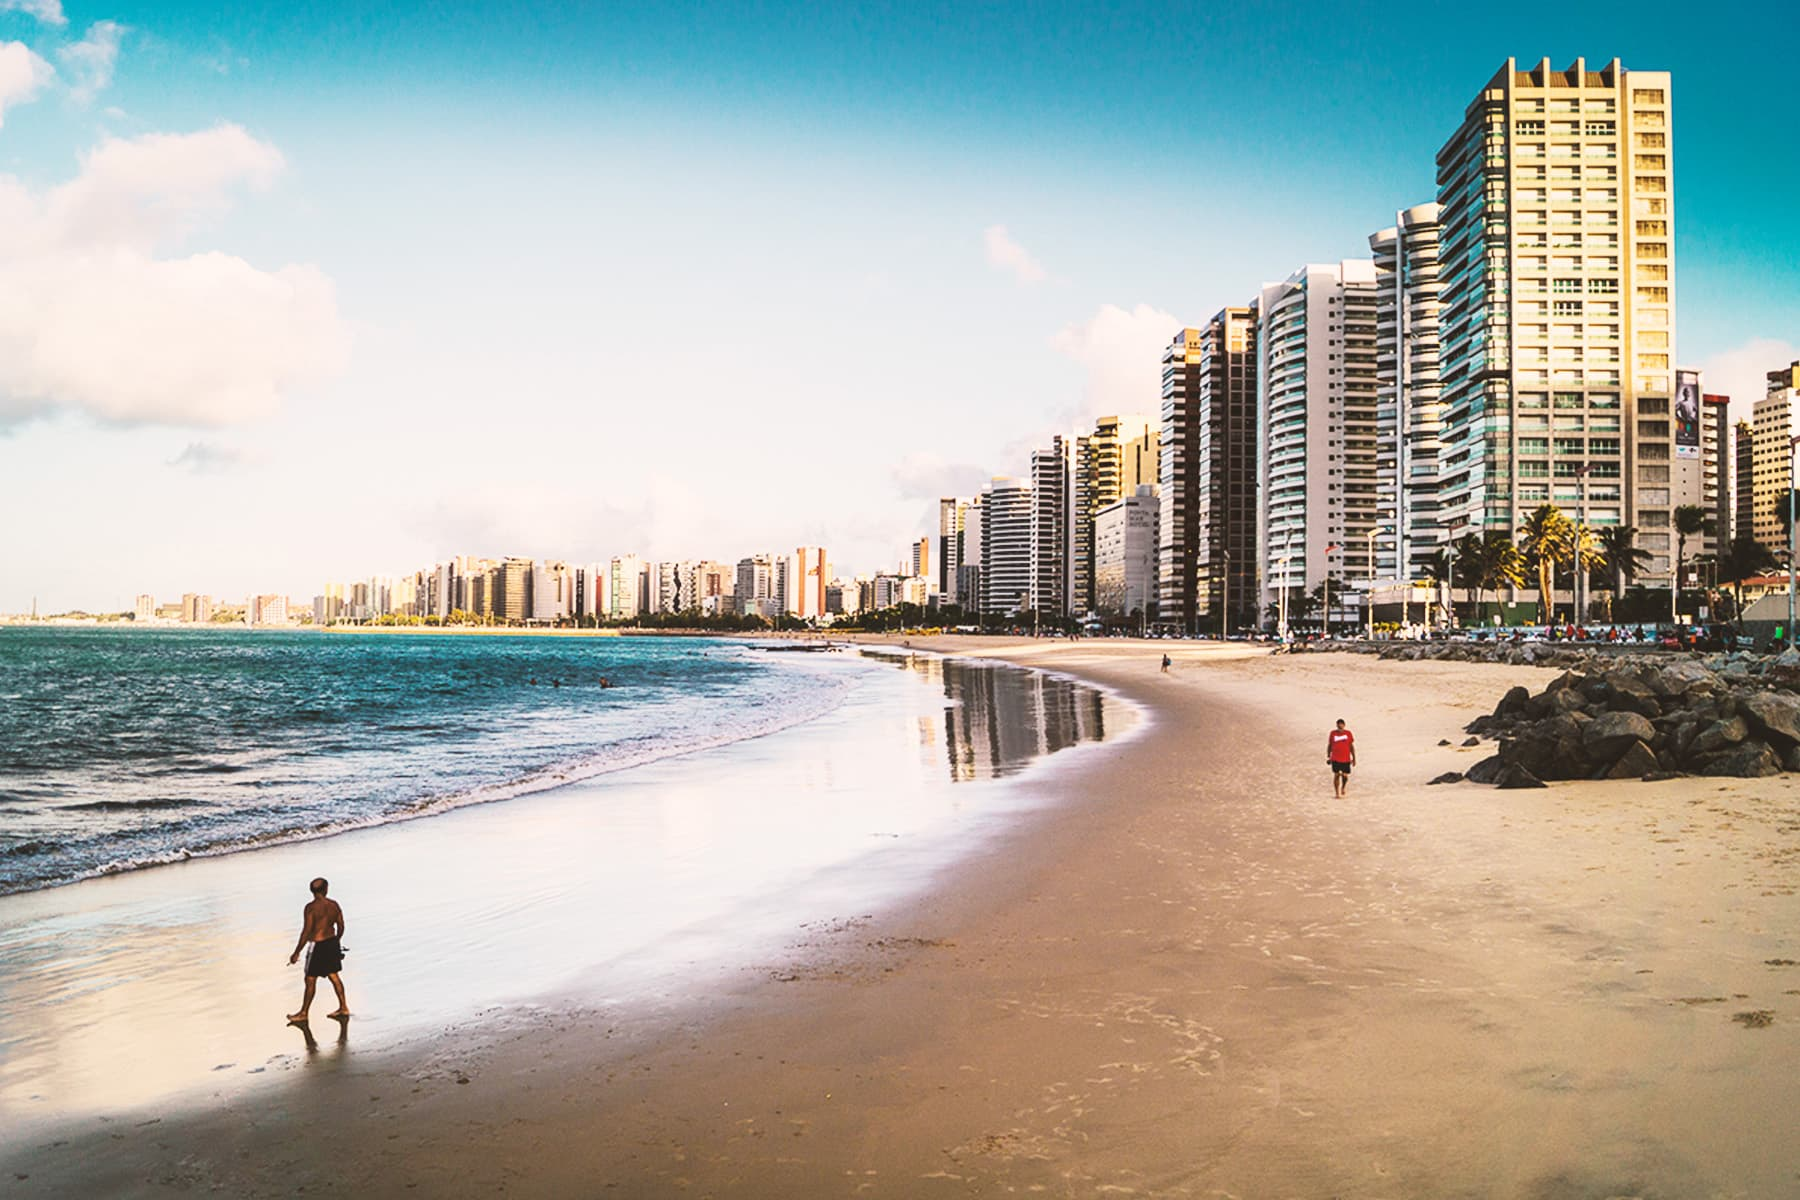 Viaggio a Fortaleza - Brasile